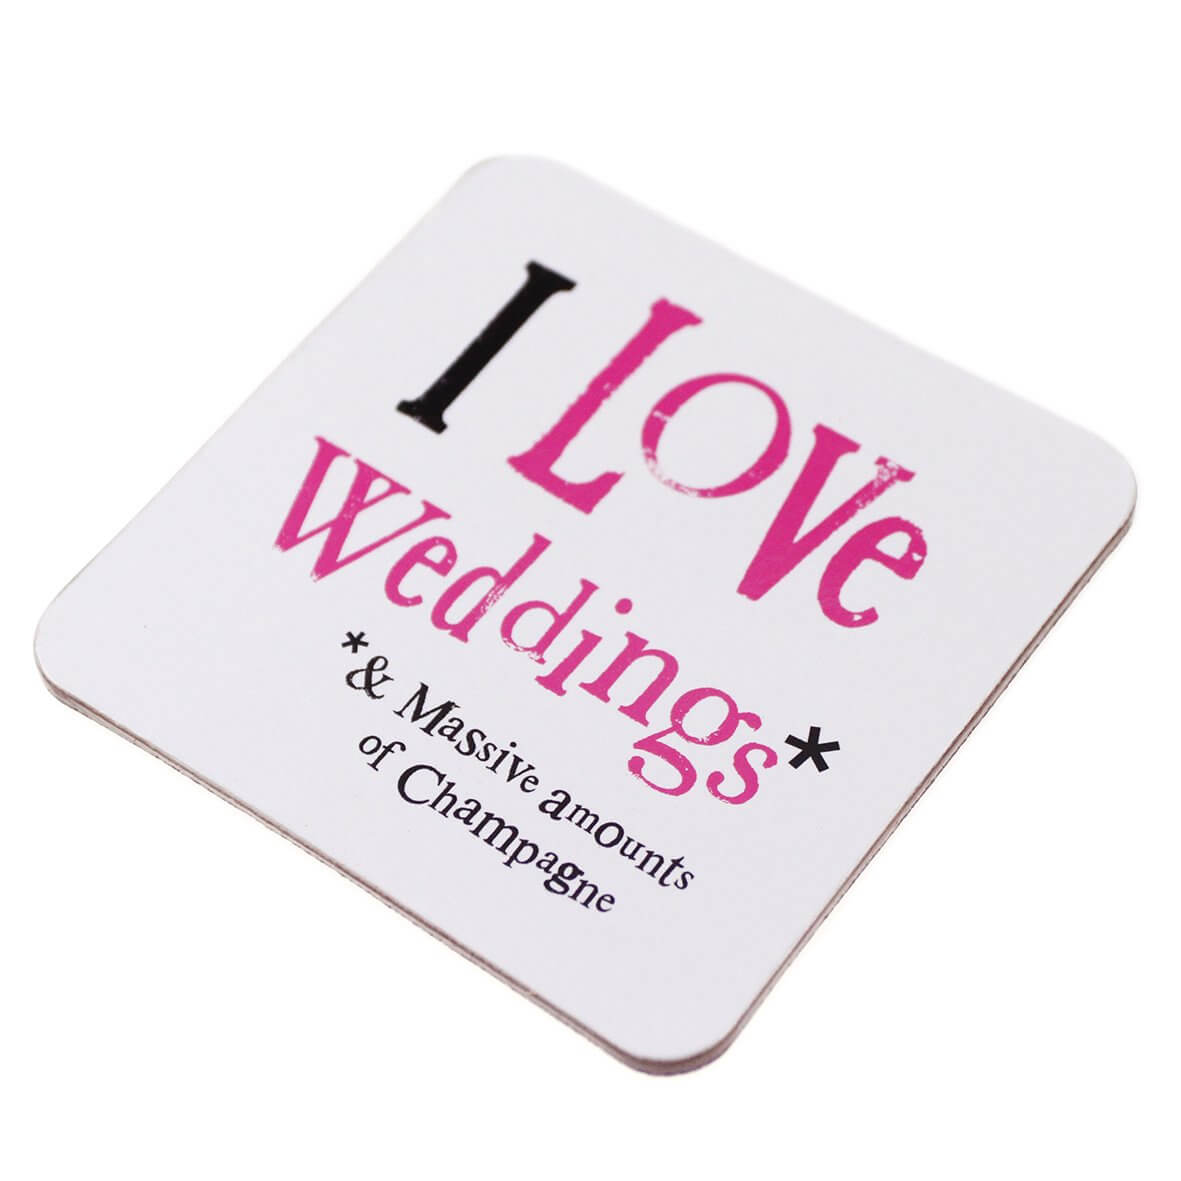 Coaster - I Love Weddings and Massive amounts of Champagne'